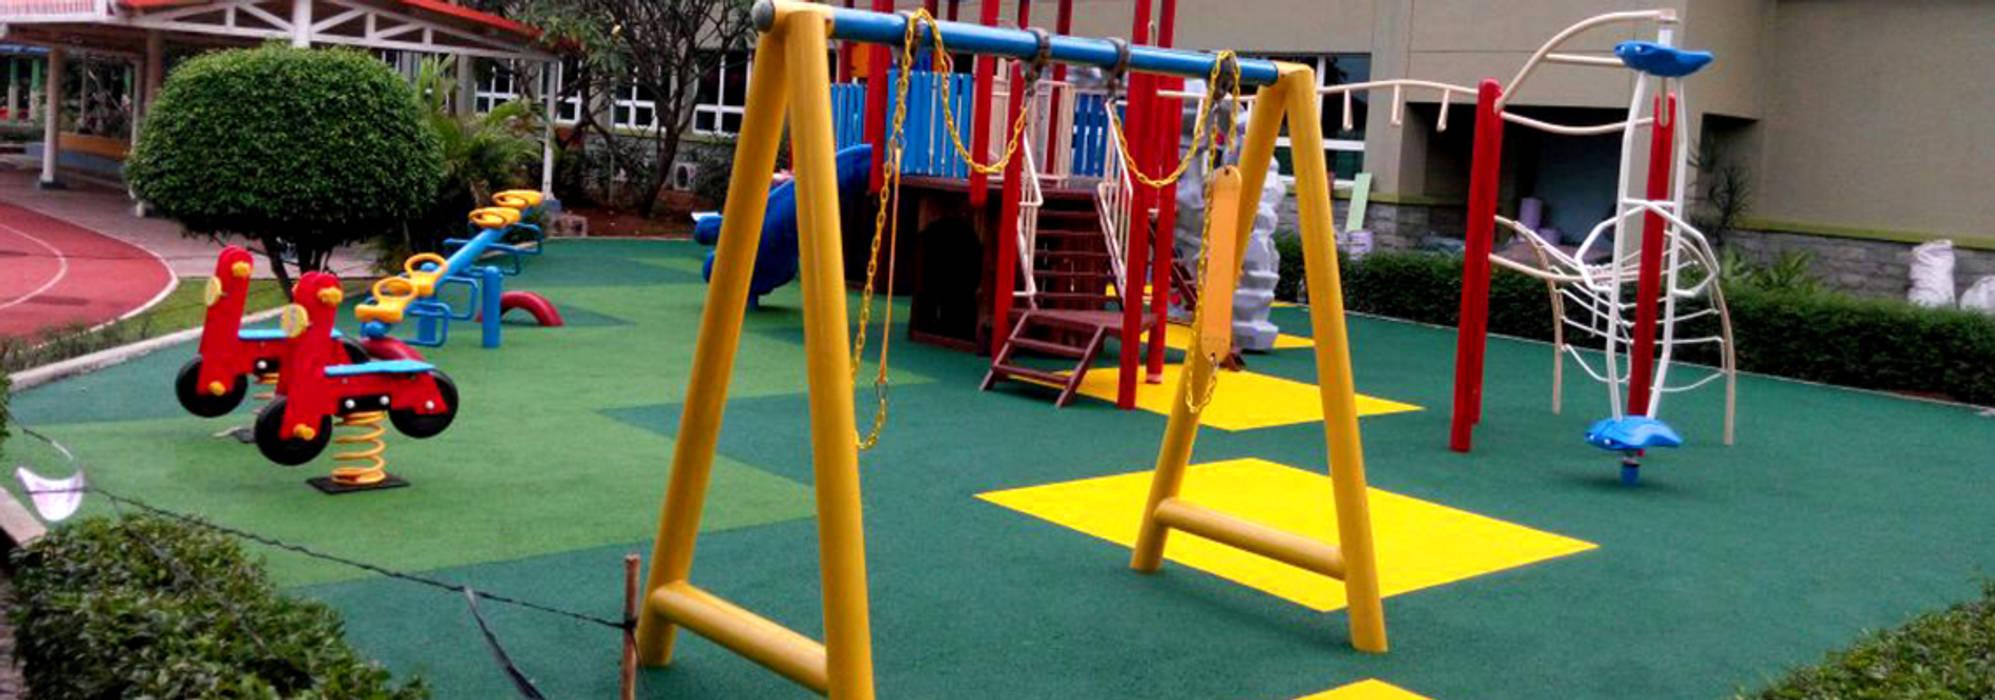 Playground Jakarta International Korea School: Sekolah oleh PT. Datra Internusa,